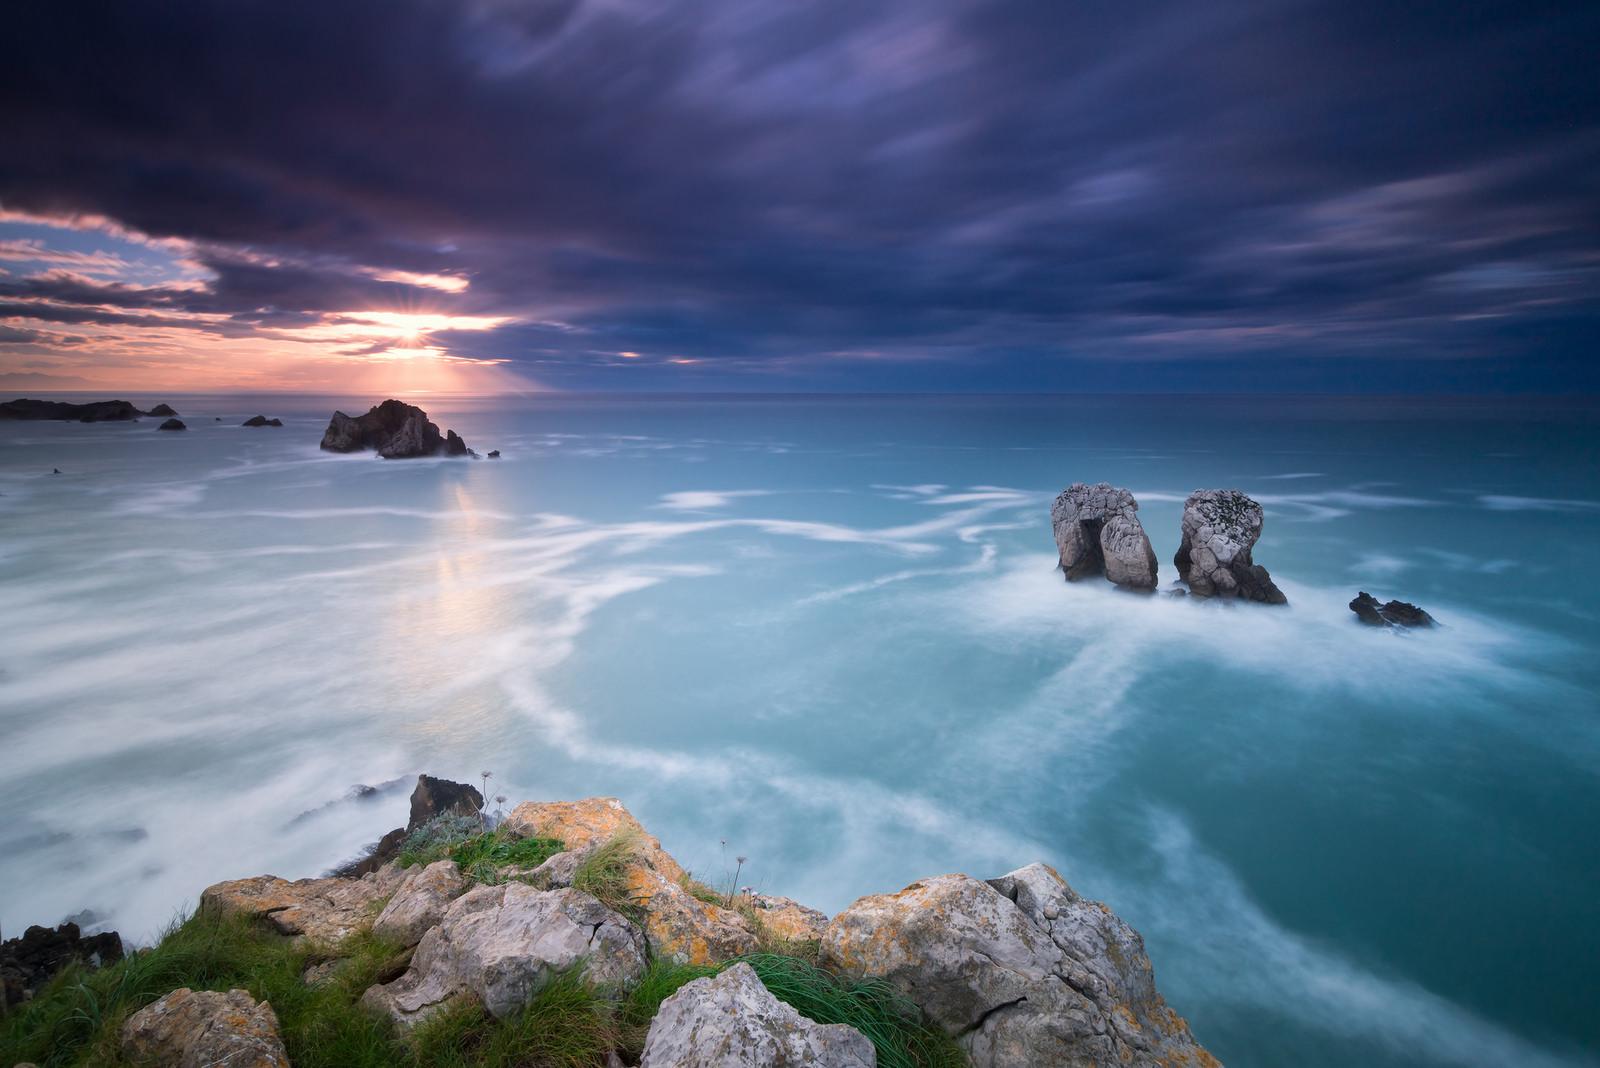 Un paisaje en la playa - 1600x1068